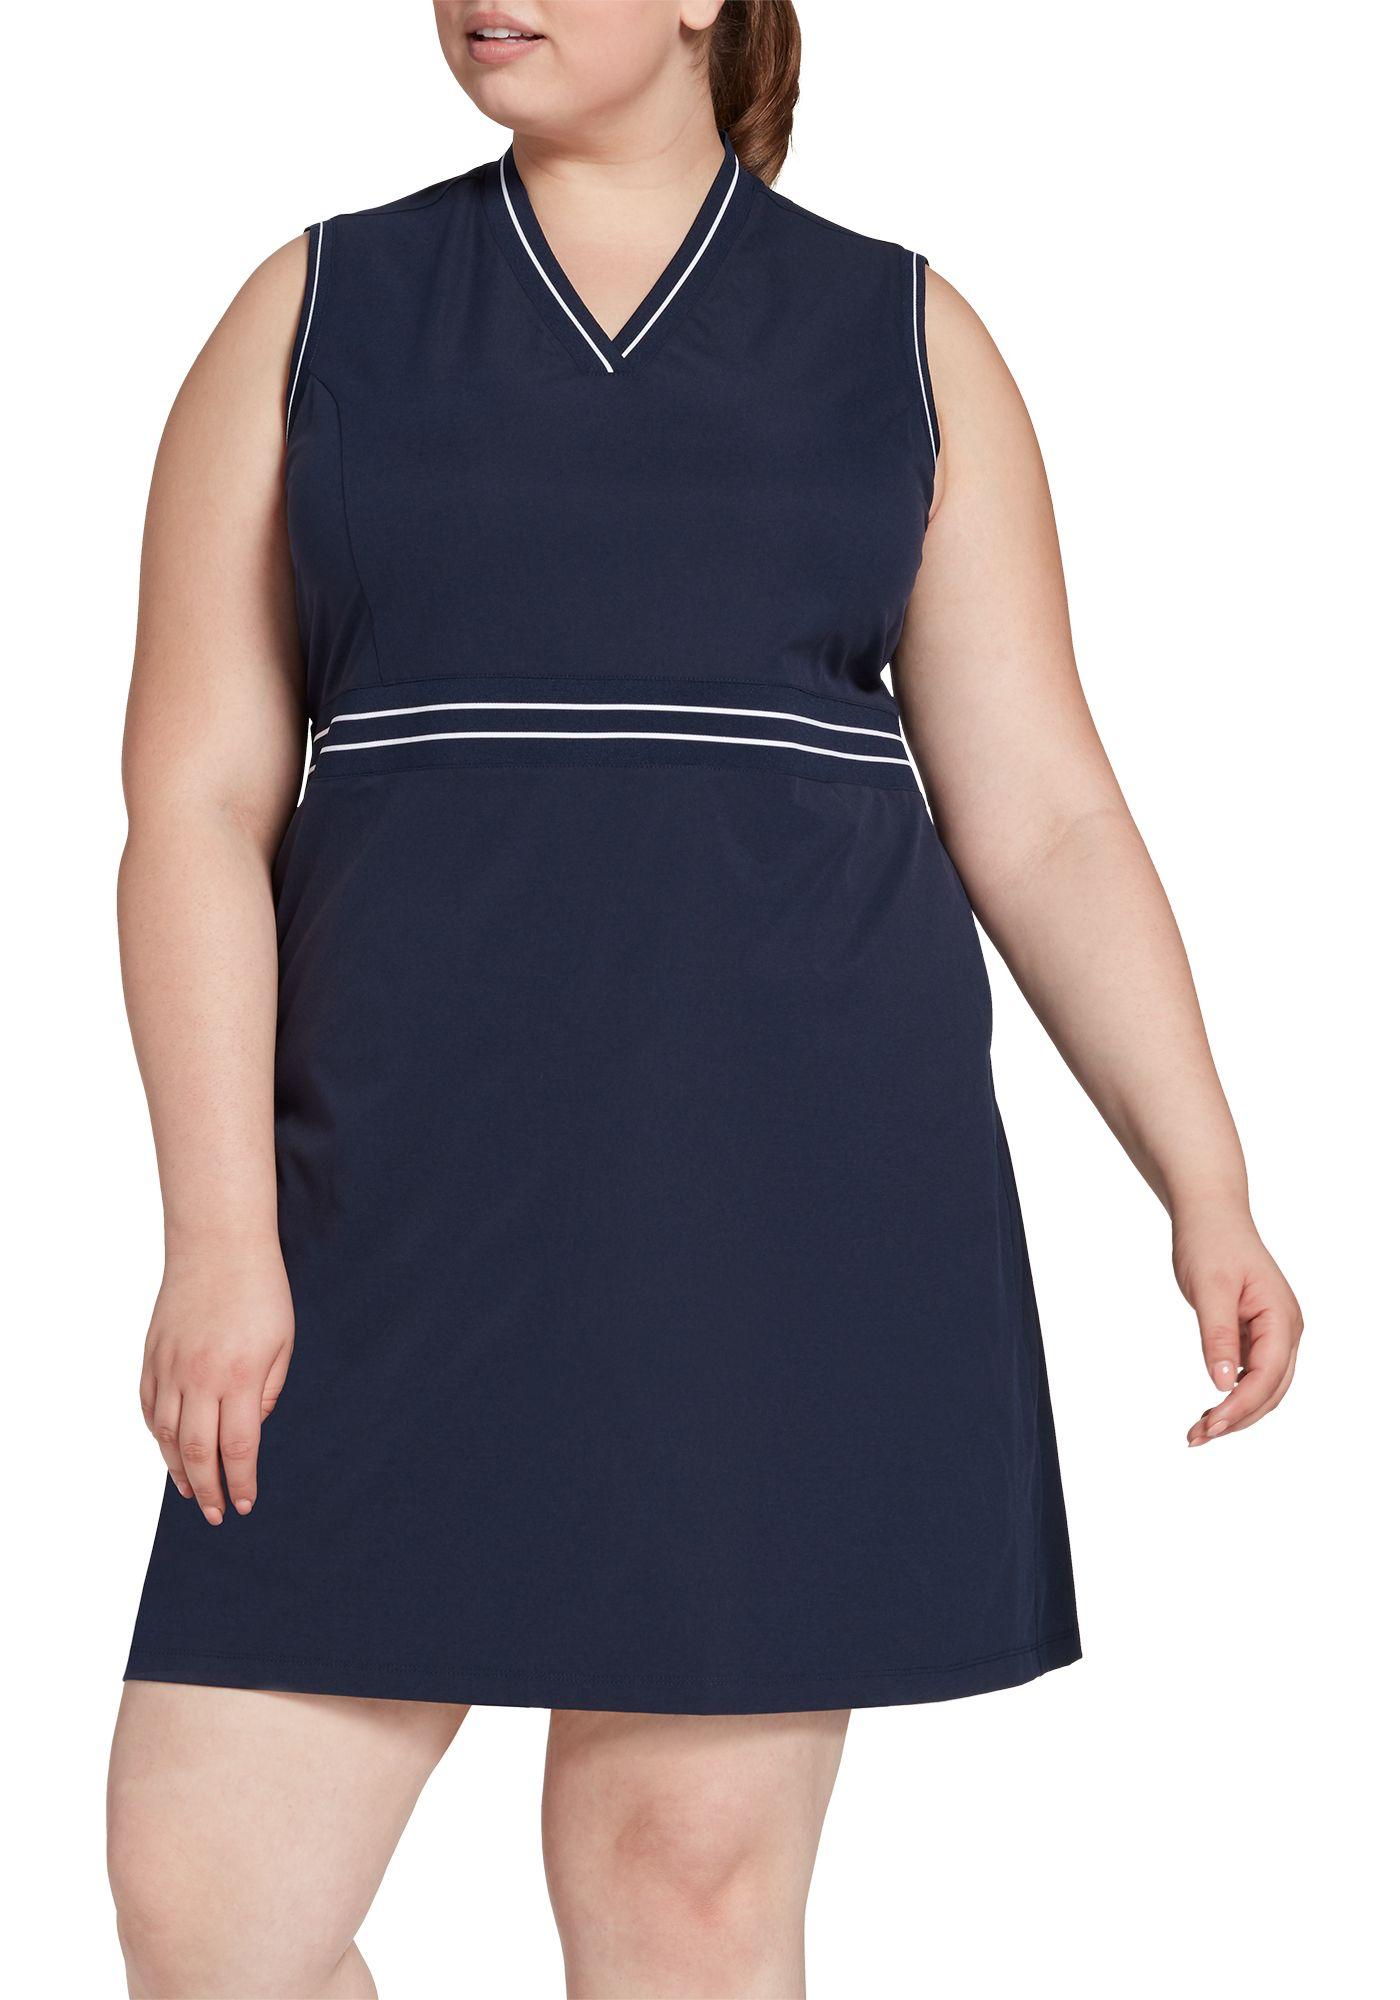 Lady Hagen Women's Green Navy Ribbed Sleeveless Golf Dress – Extended Sizes